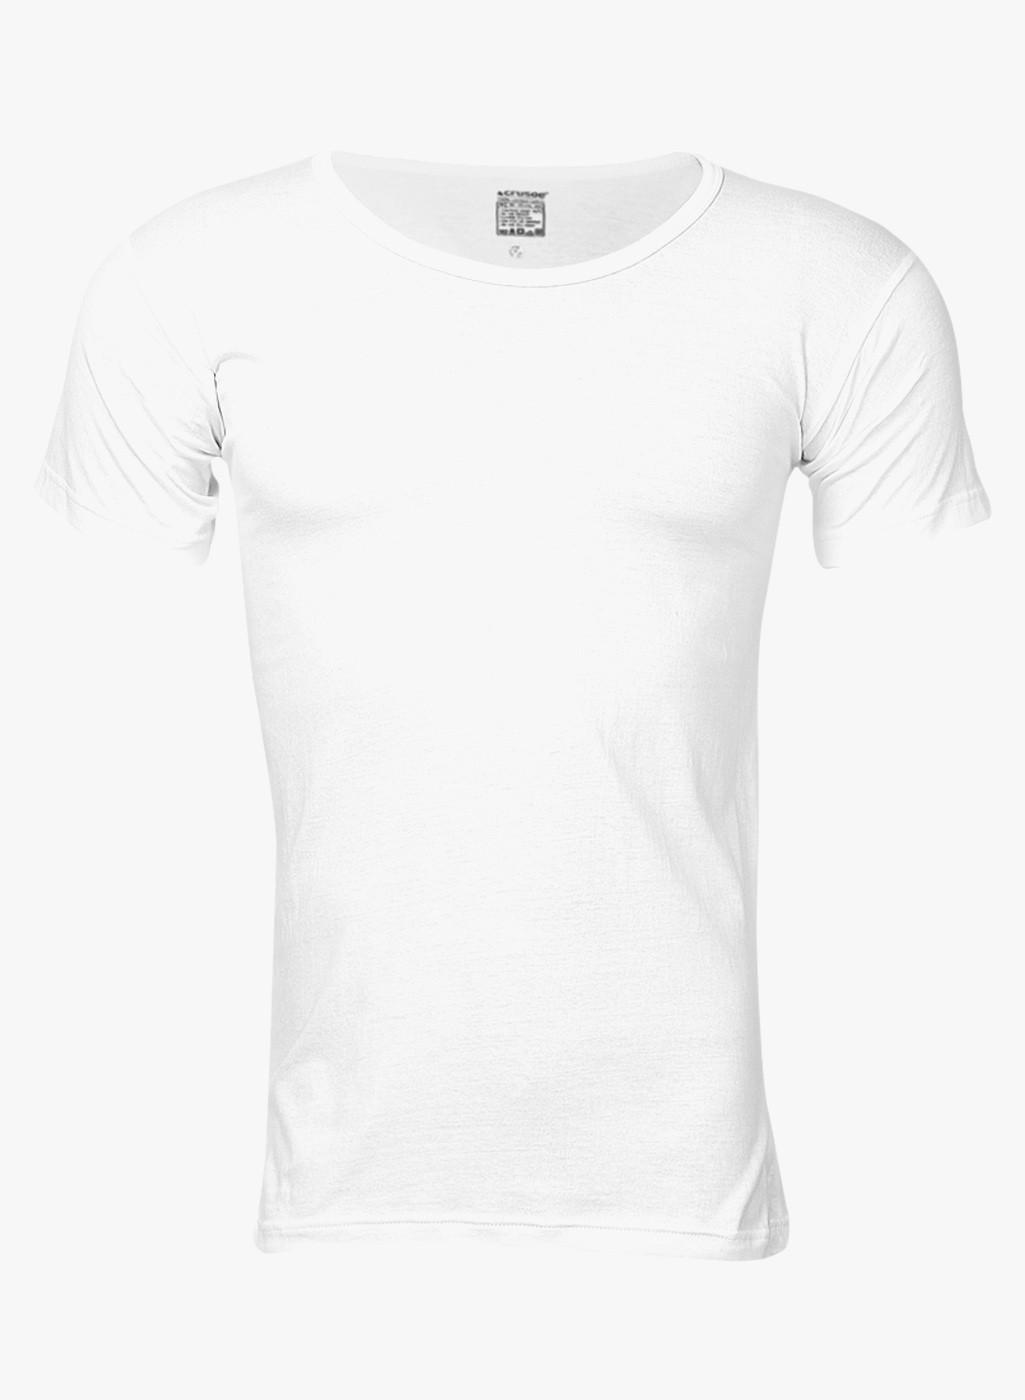 White Round Neck Cotton Vest